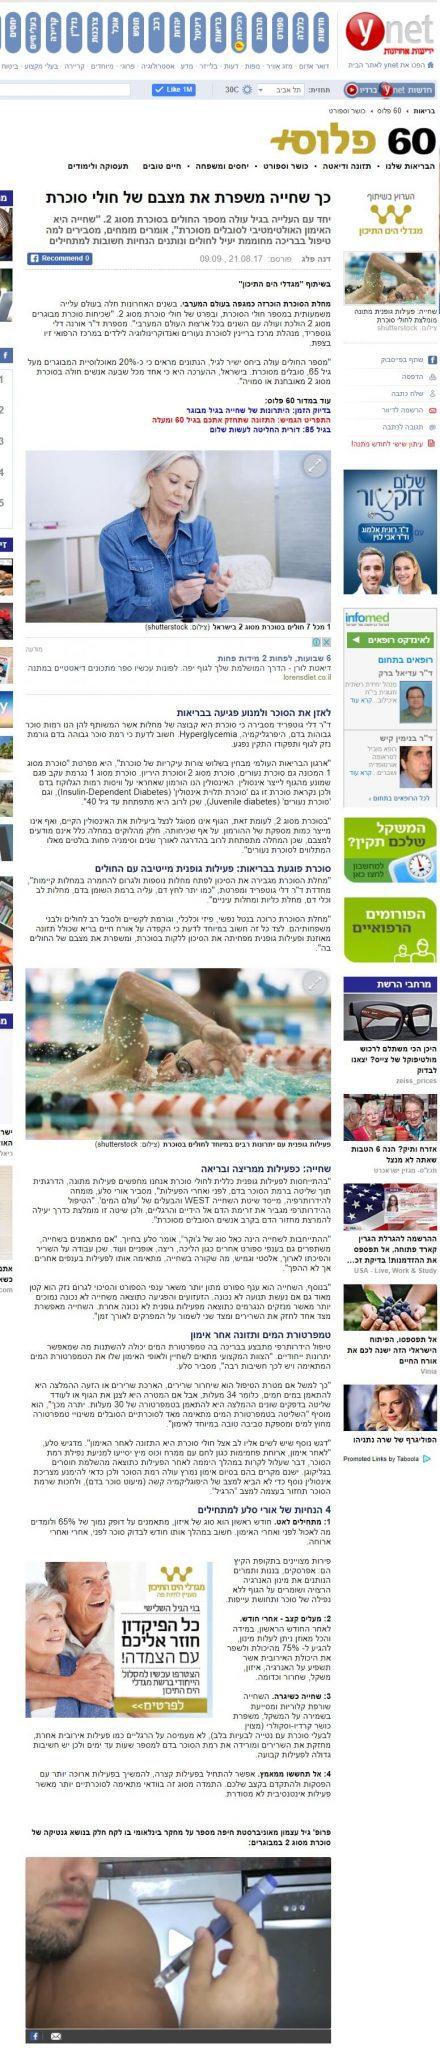 ynet: שחייה לטיפול בחולי סוכרת